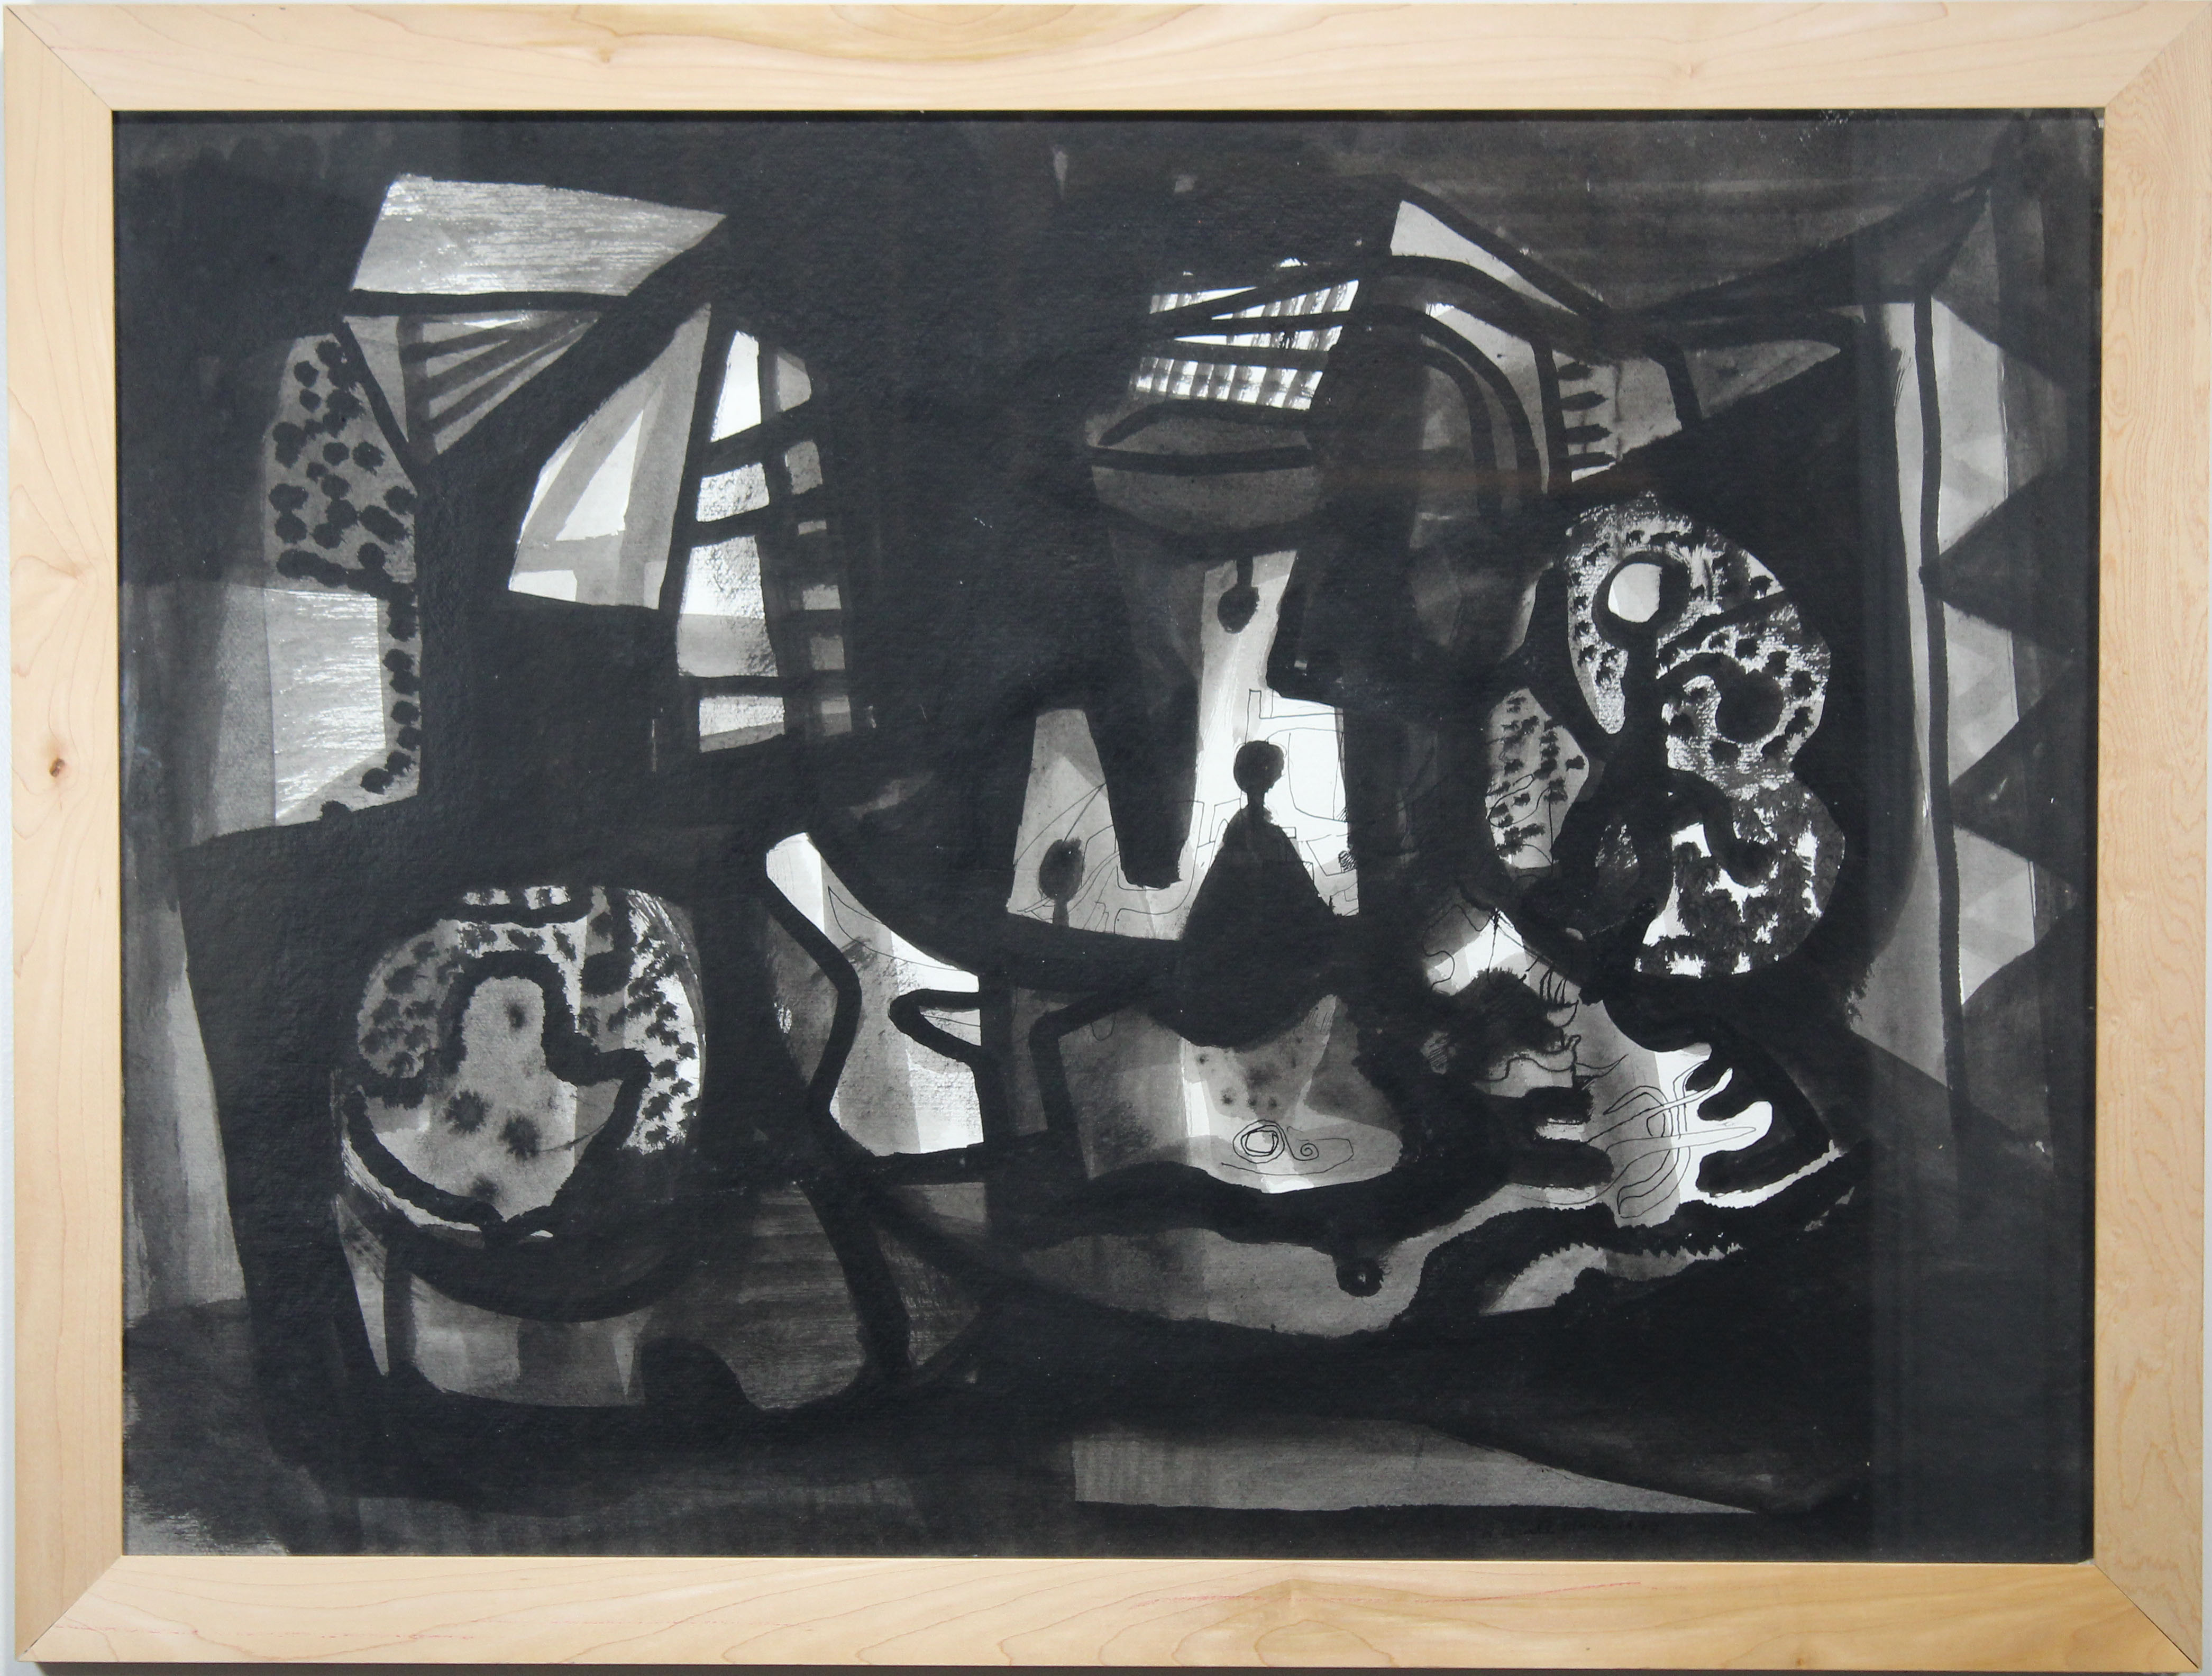 Lot 12 - Roberto Burle Marx (Brazil, 1909 - 1994)